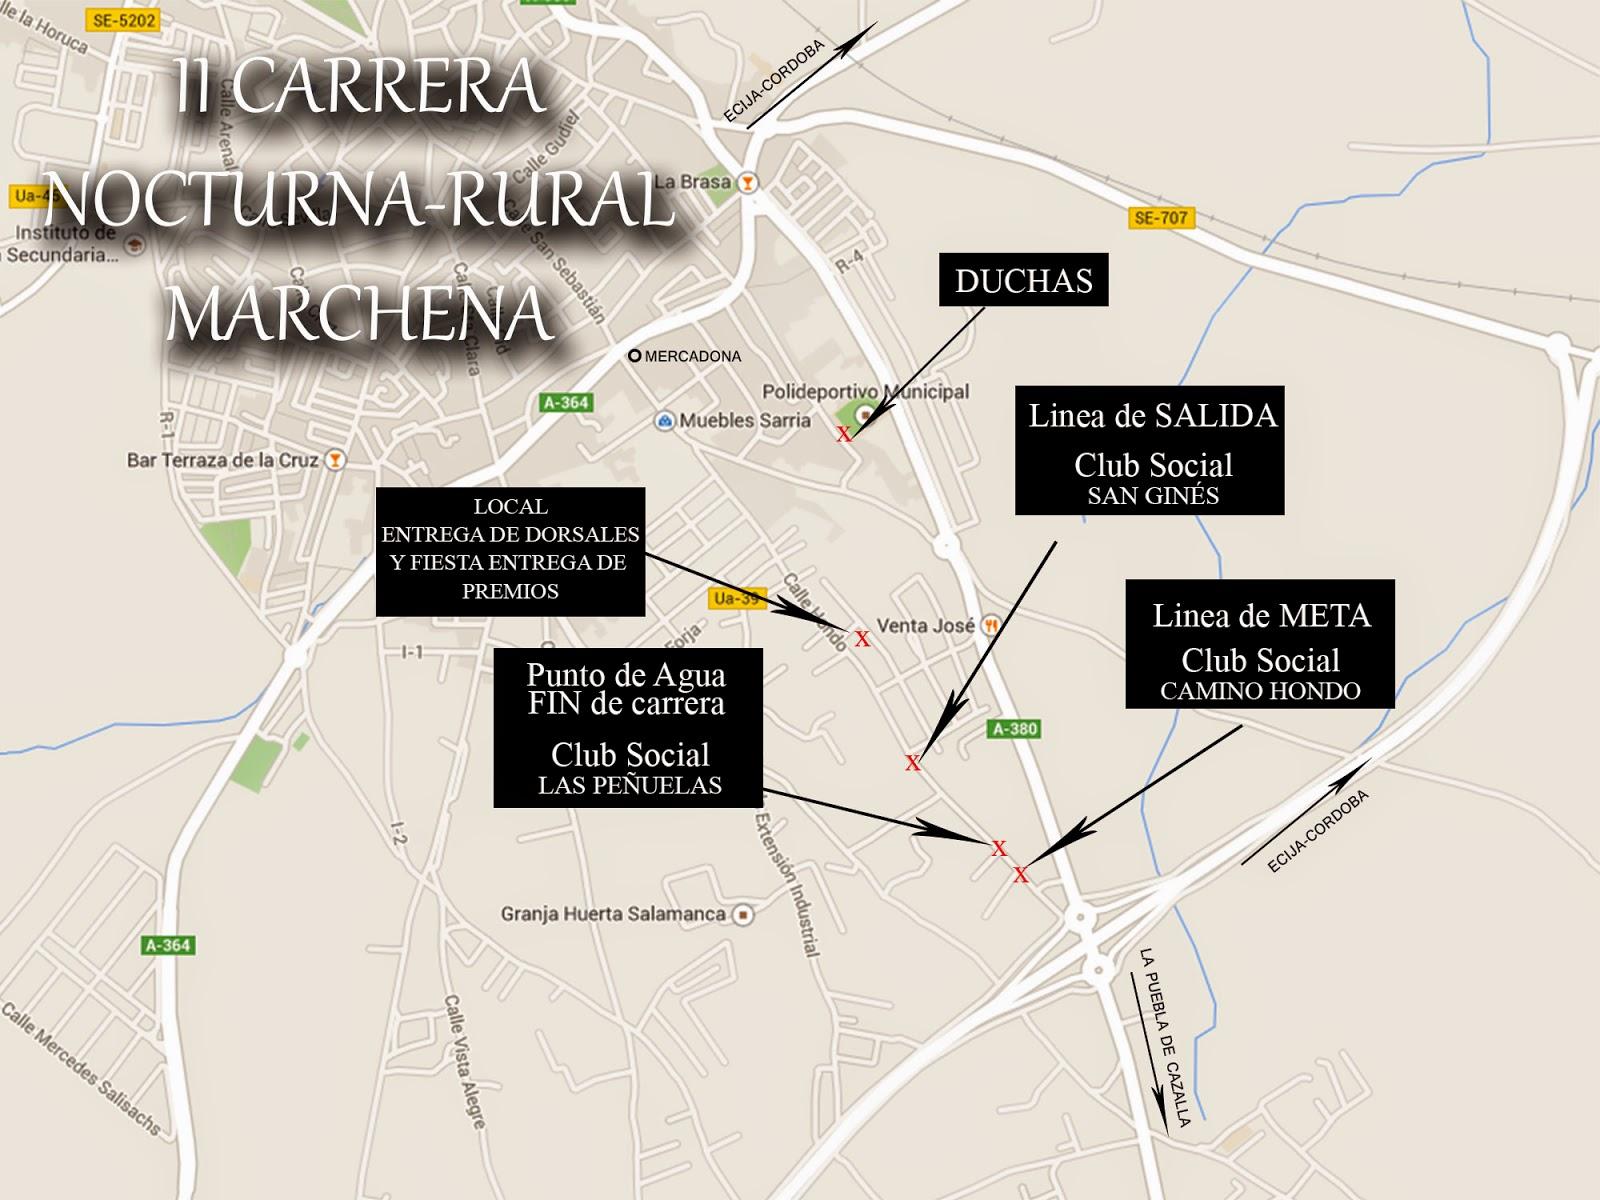 AionSur mapa%2Bde%2Blocalizaci%C3%B3n Qué hacer en Marchena este fin de semana Marchena Provincia